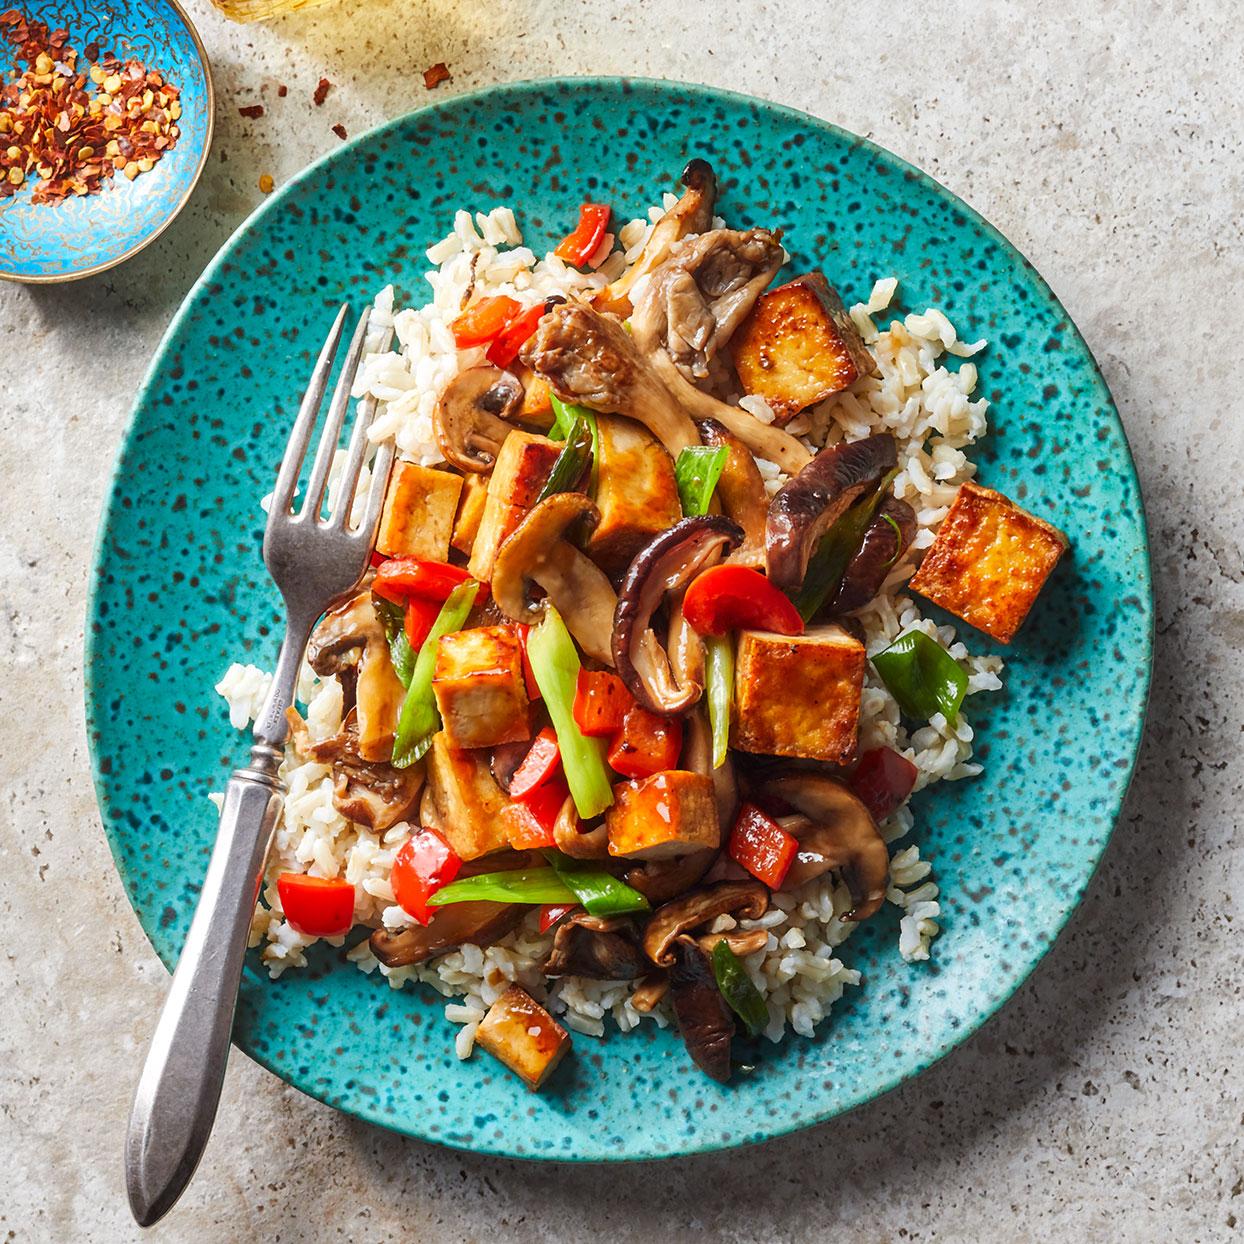 Mushroom & Tofu Stir-Fry Breana Killeen